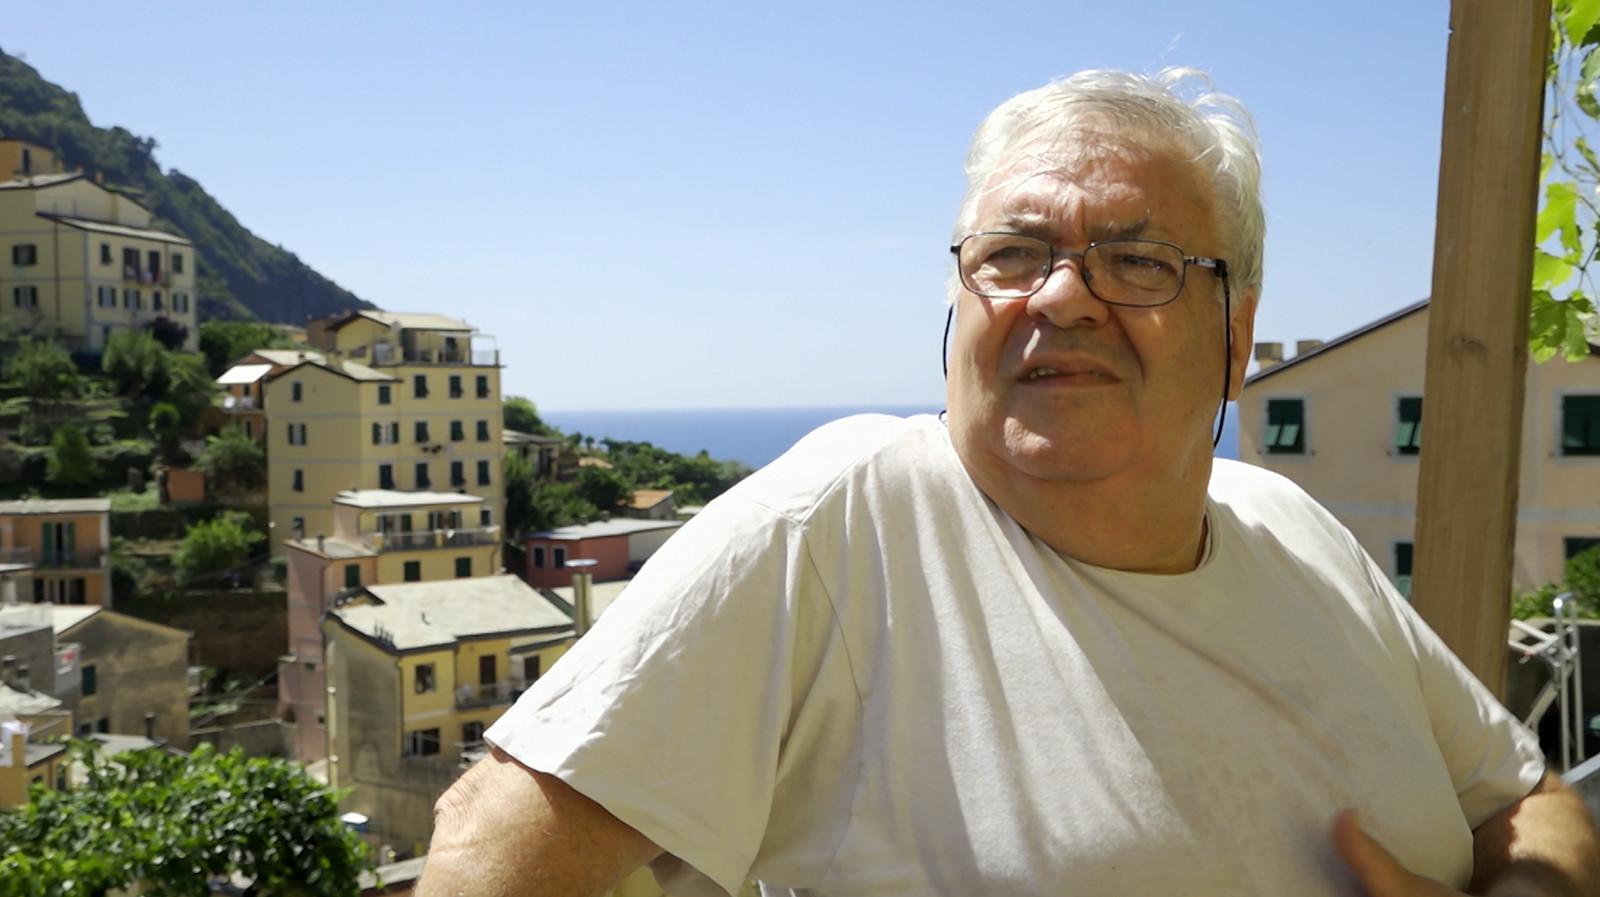 Giuseppe Giacinto inwoner 84 jaar oud van Riomaggiore.